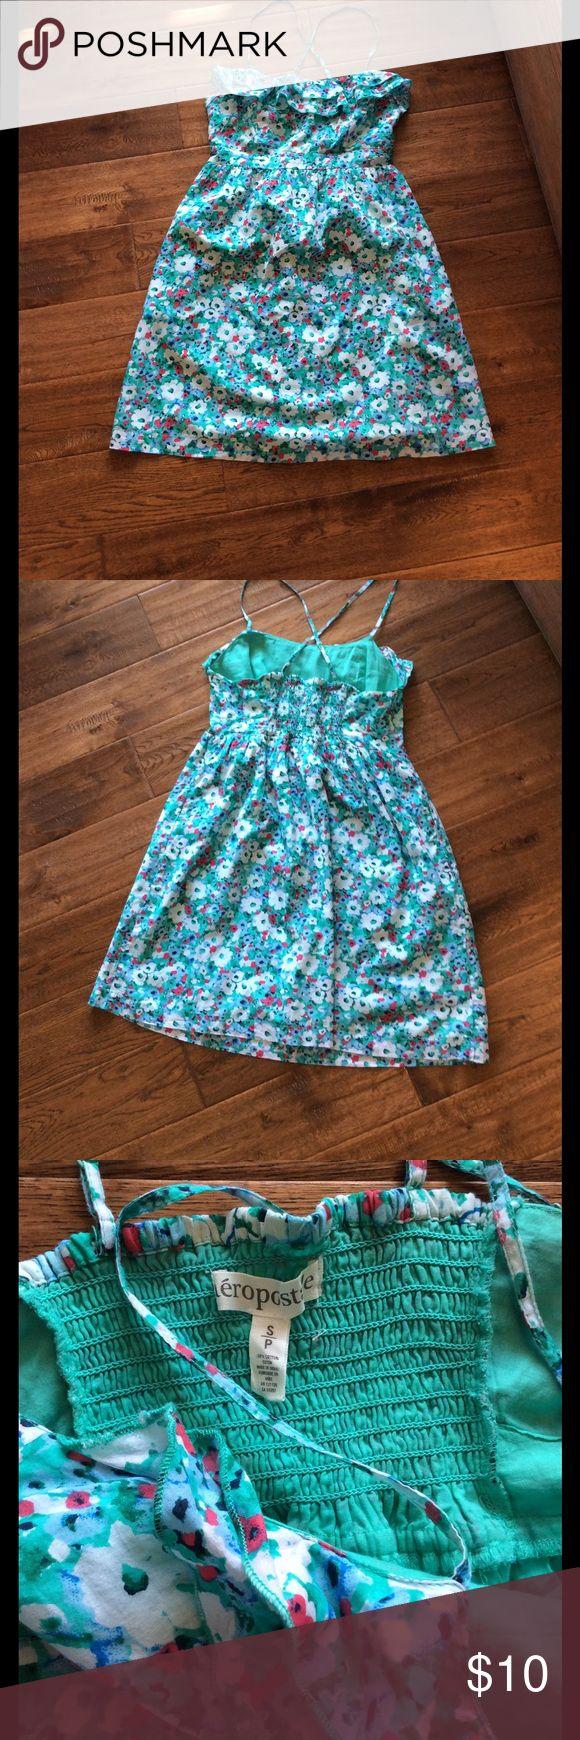 Juniors Aeropostale sun dress size small. Like new Cotton sun dress with lining, adjustable straps. Juniors size small. Perfect for Easter. Aeropostale Dresses Casual